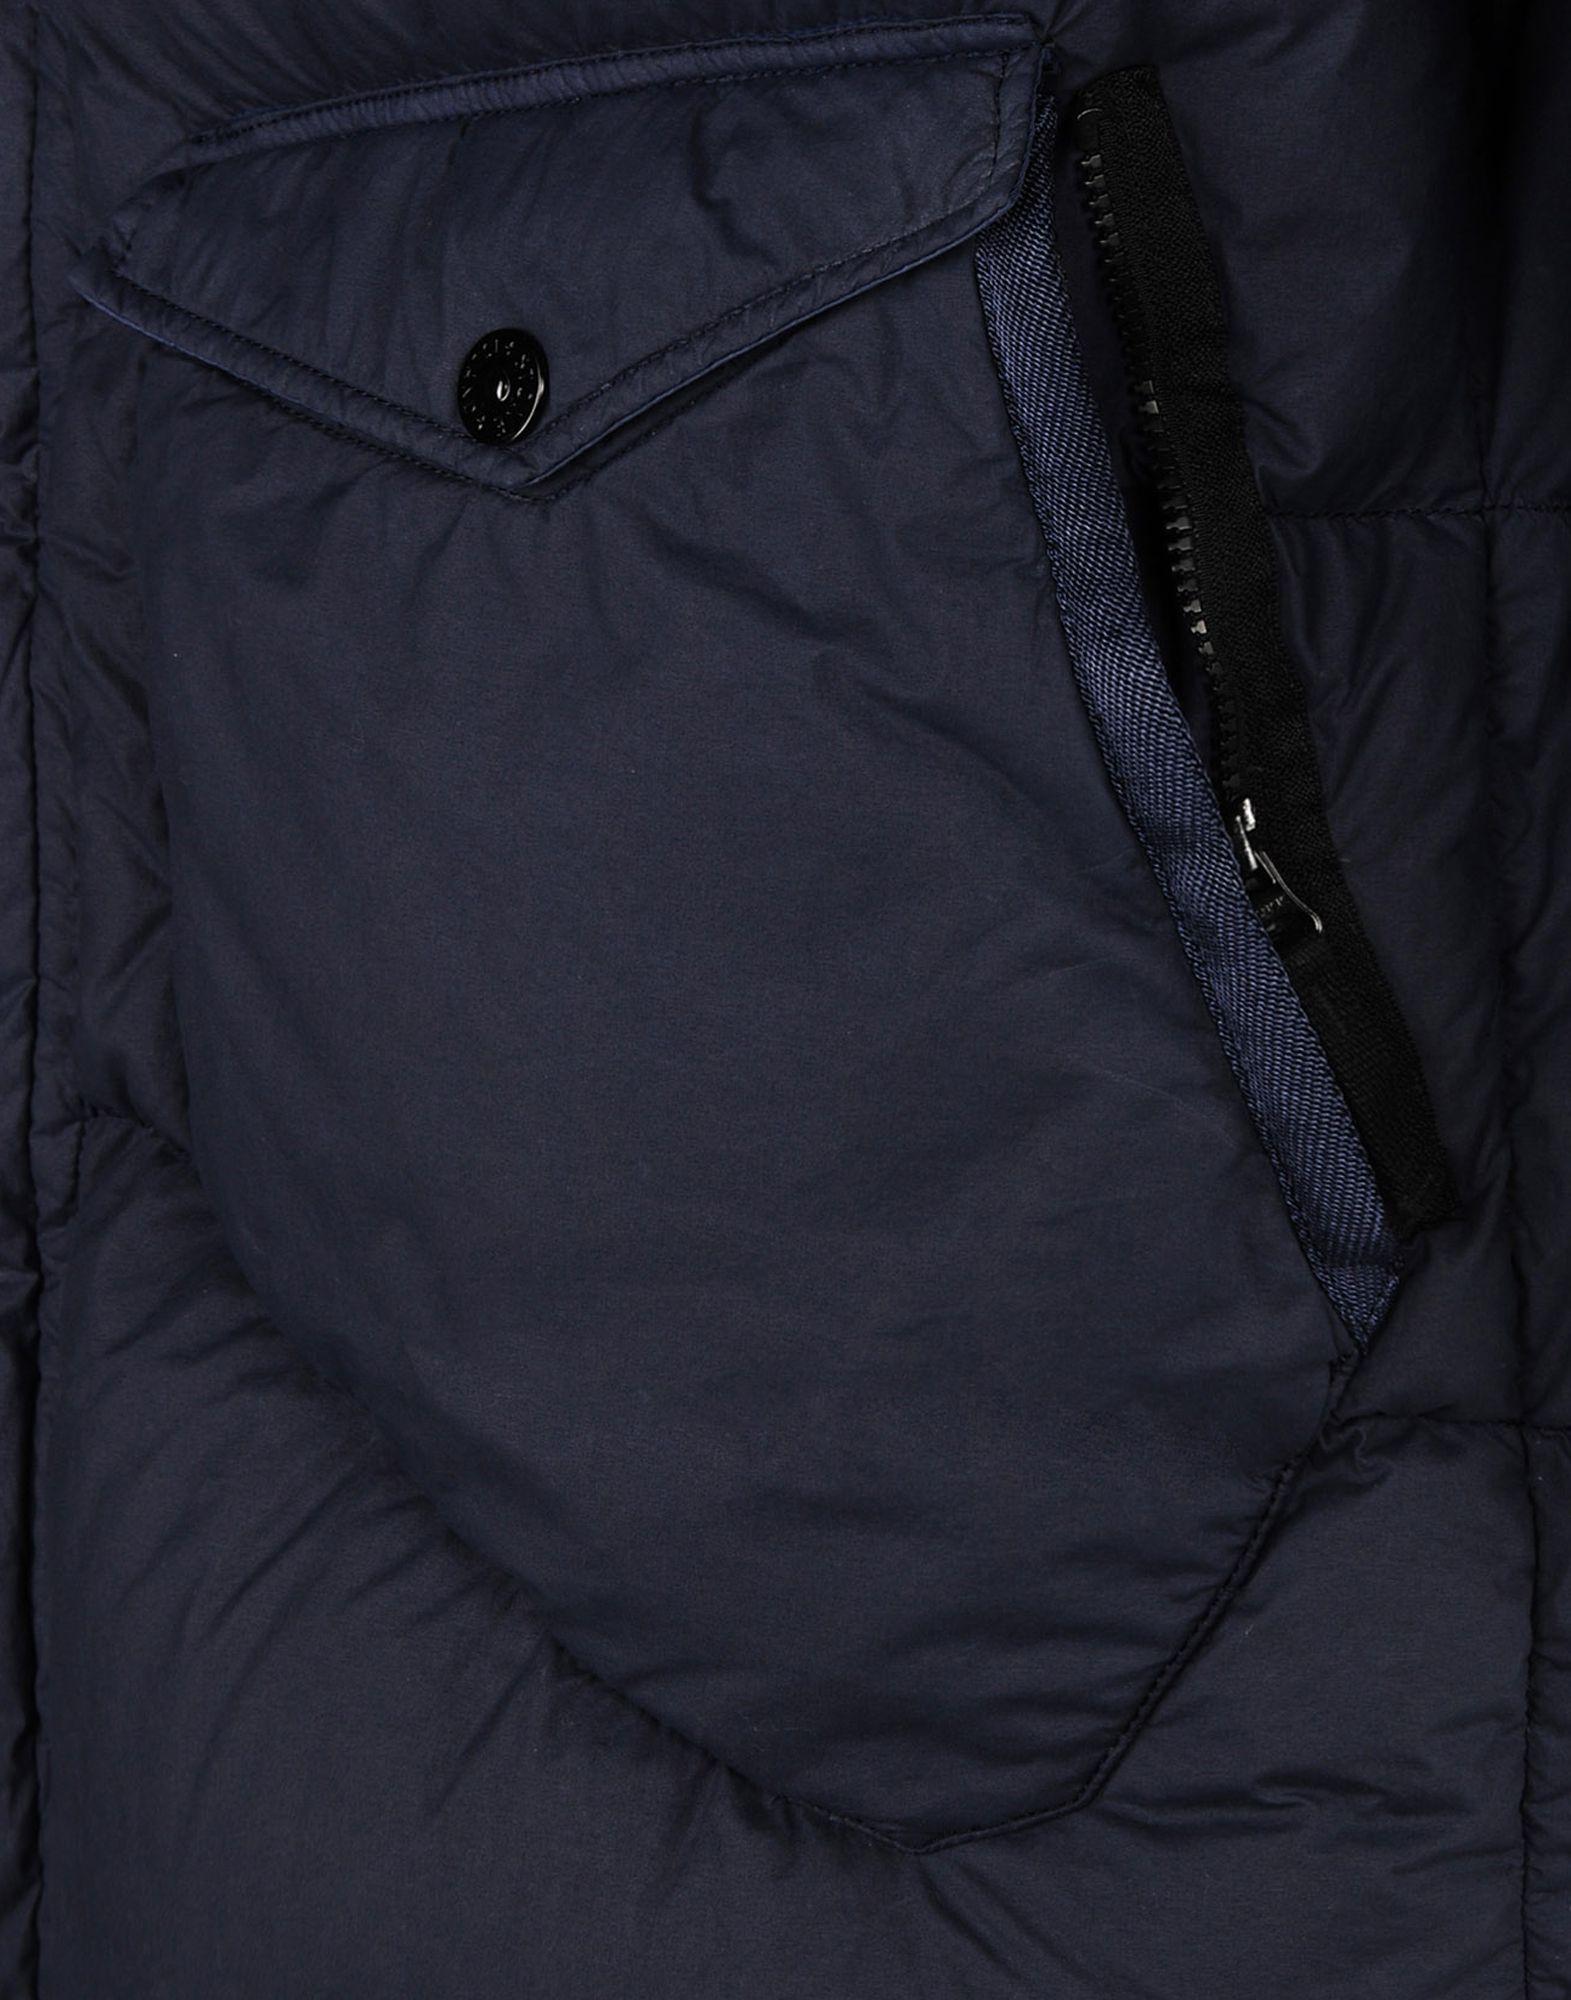 fcd3012de 43232 GARMENT DYED ORGANIC FEEL TELA NY DOWN Down Jacket Stone ...